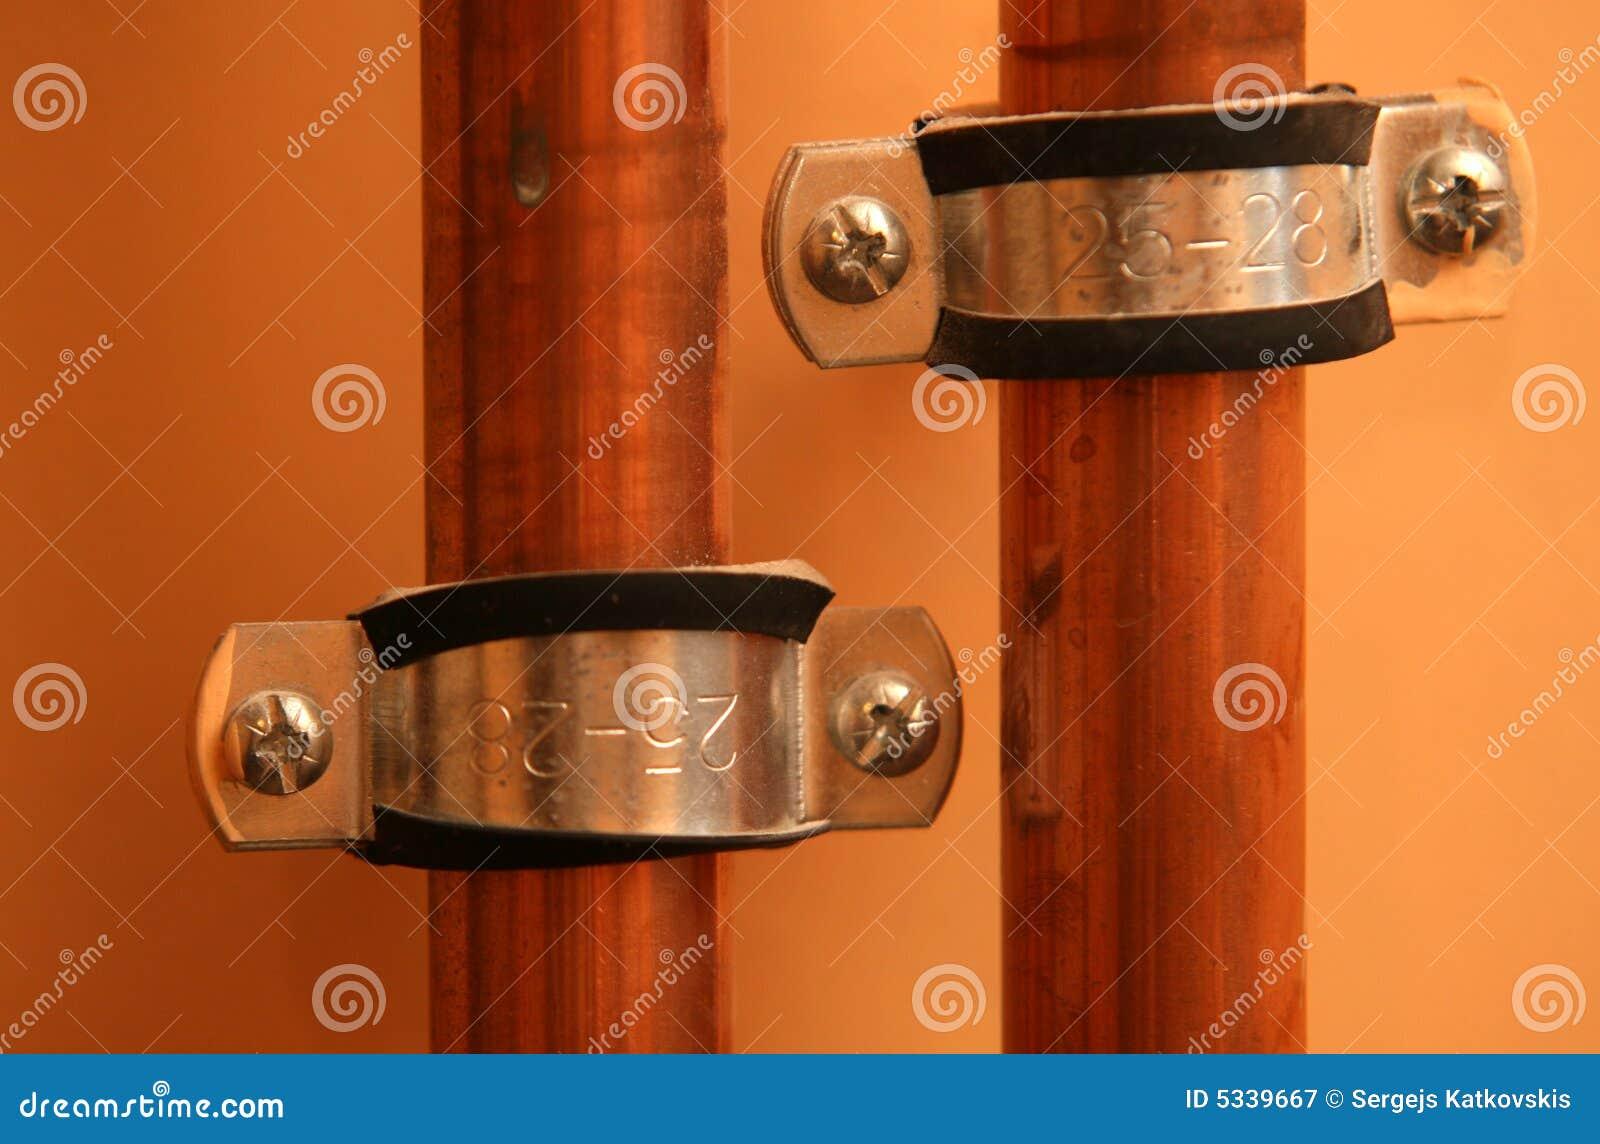 rohre stockbild. bild von haupt, metall, gruppe, magnetfeld - 5339667